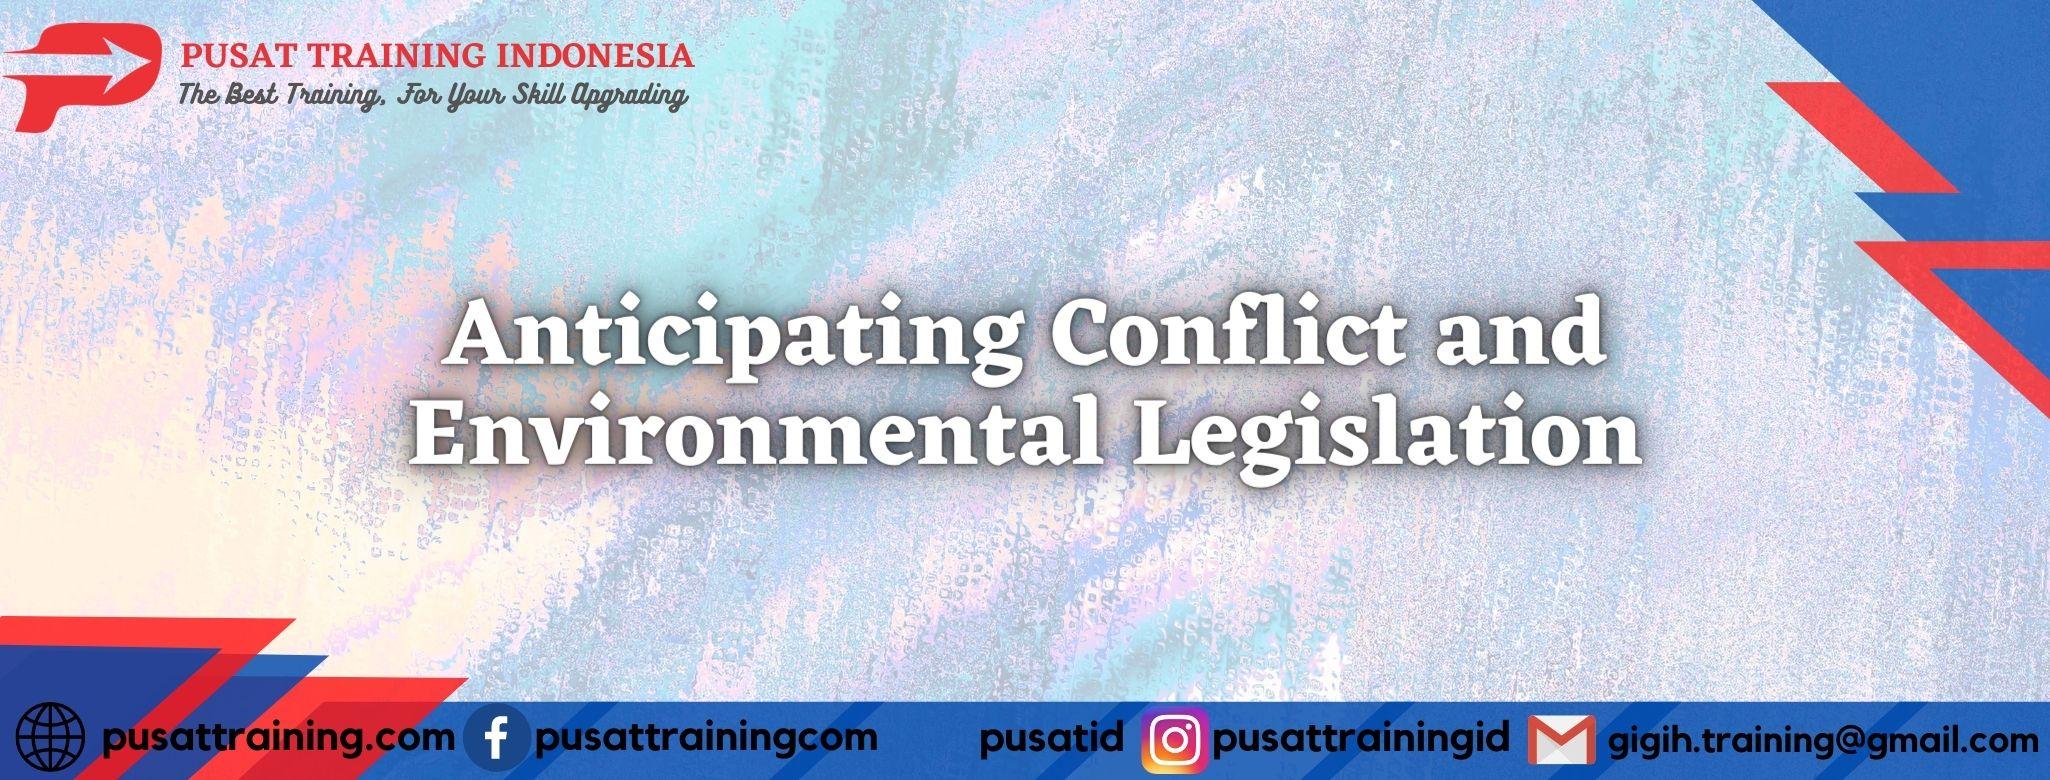 Anticipating-Conflict-and-Environmental-Legislation